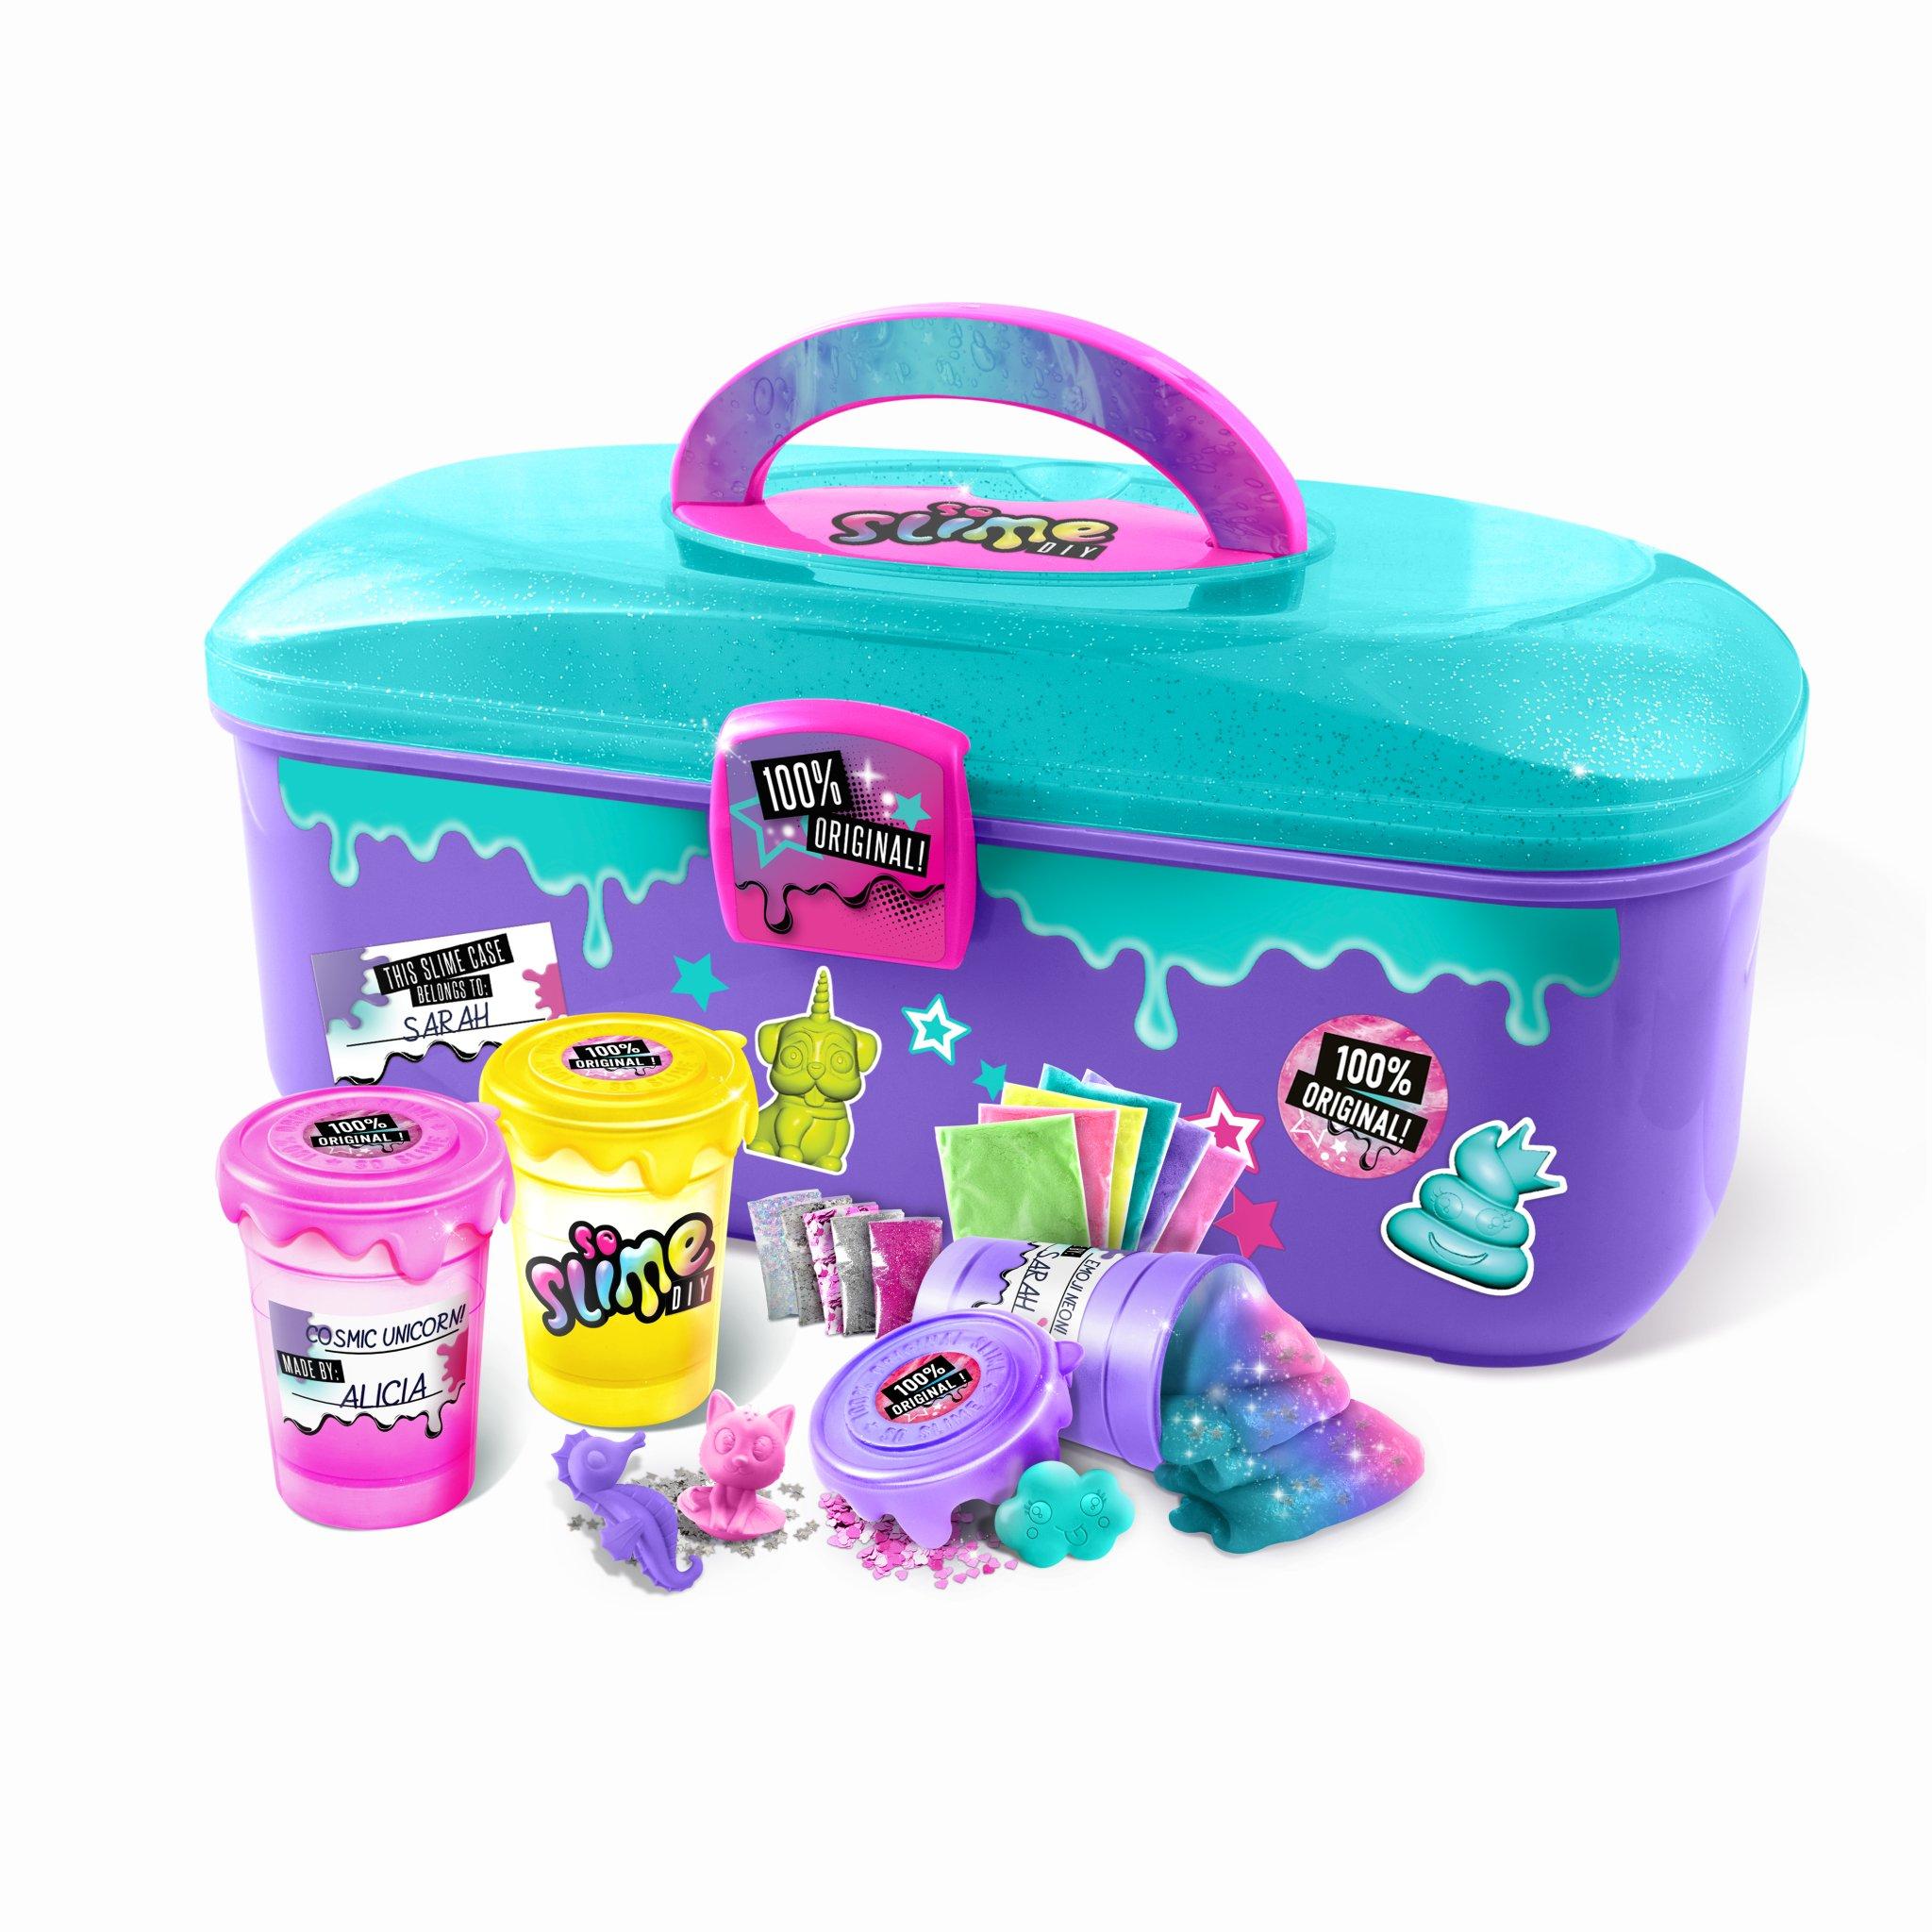 Canal Toys - So Slime DIY Caddy by Canal Toys USA Ltd